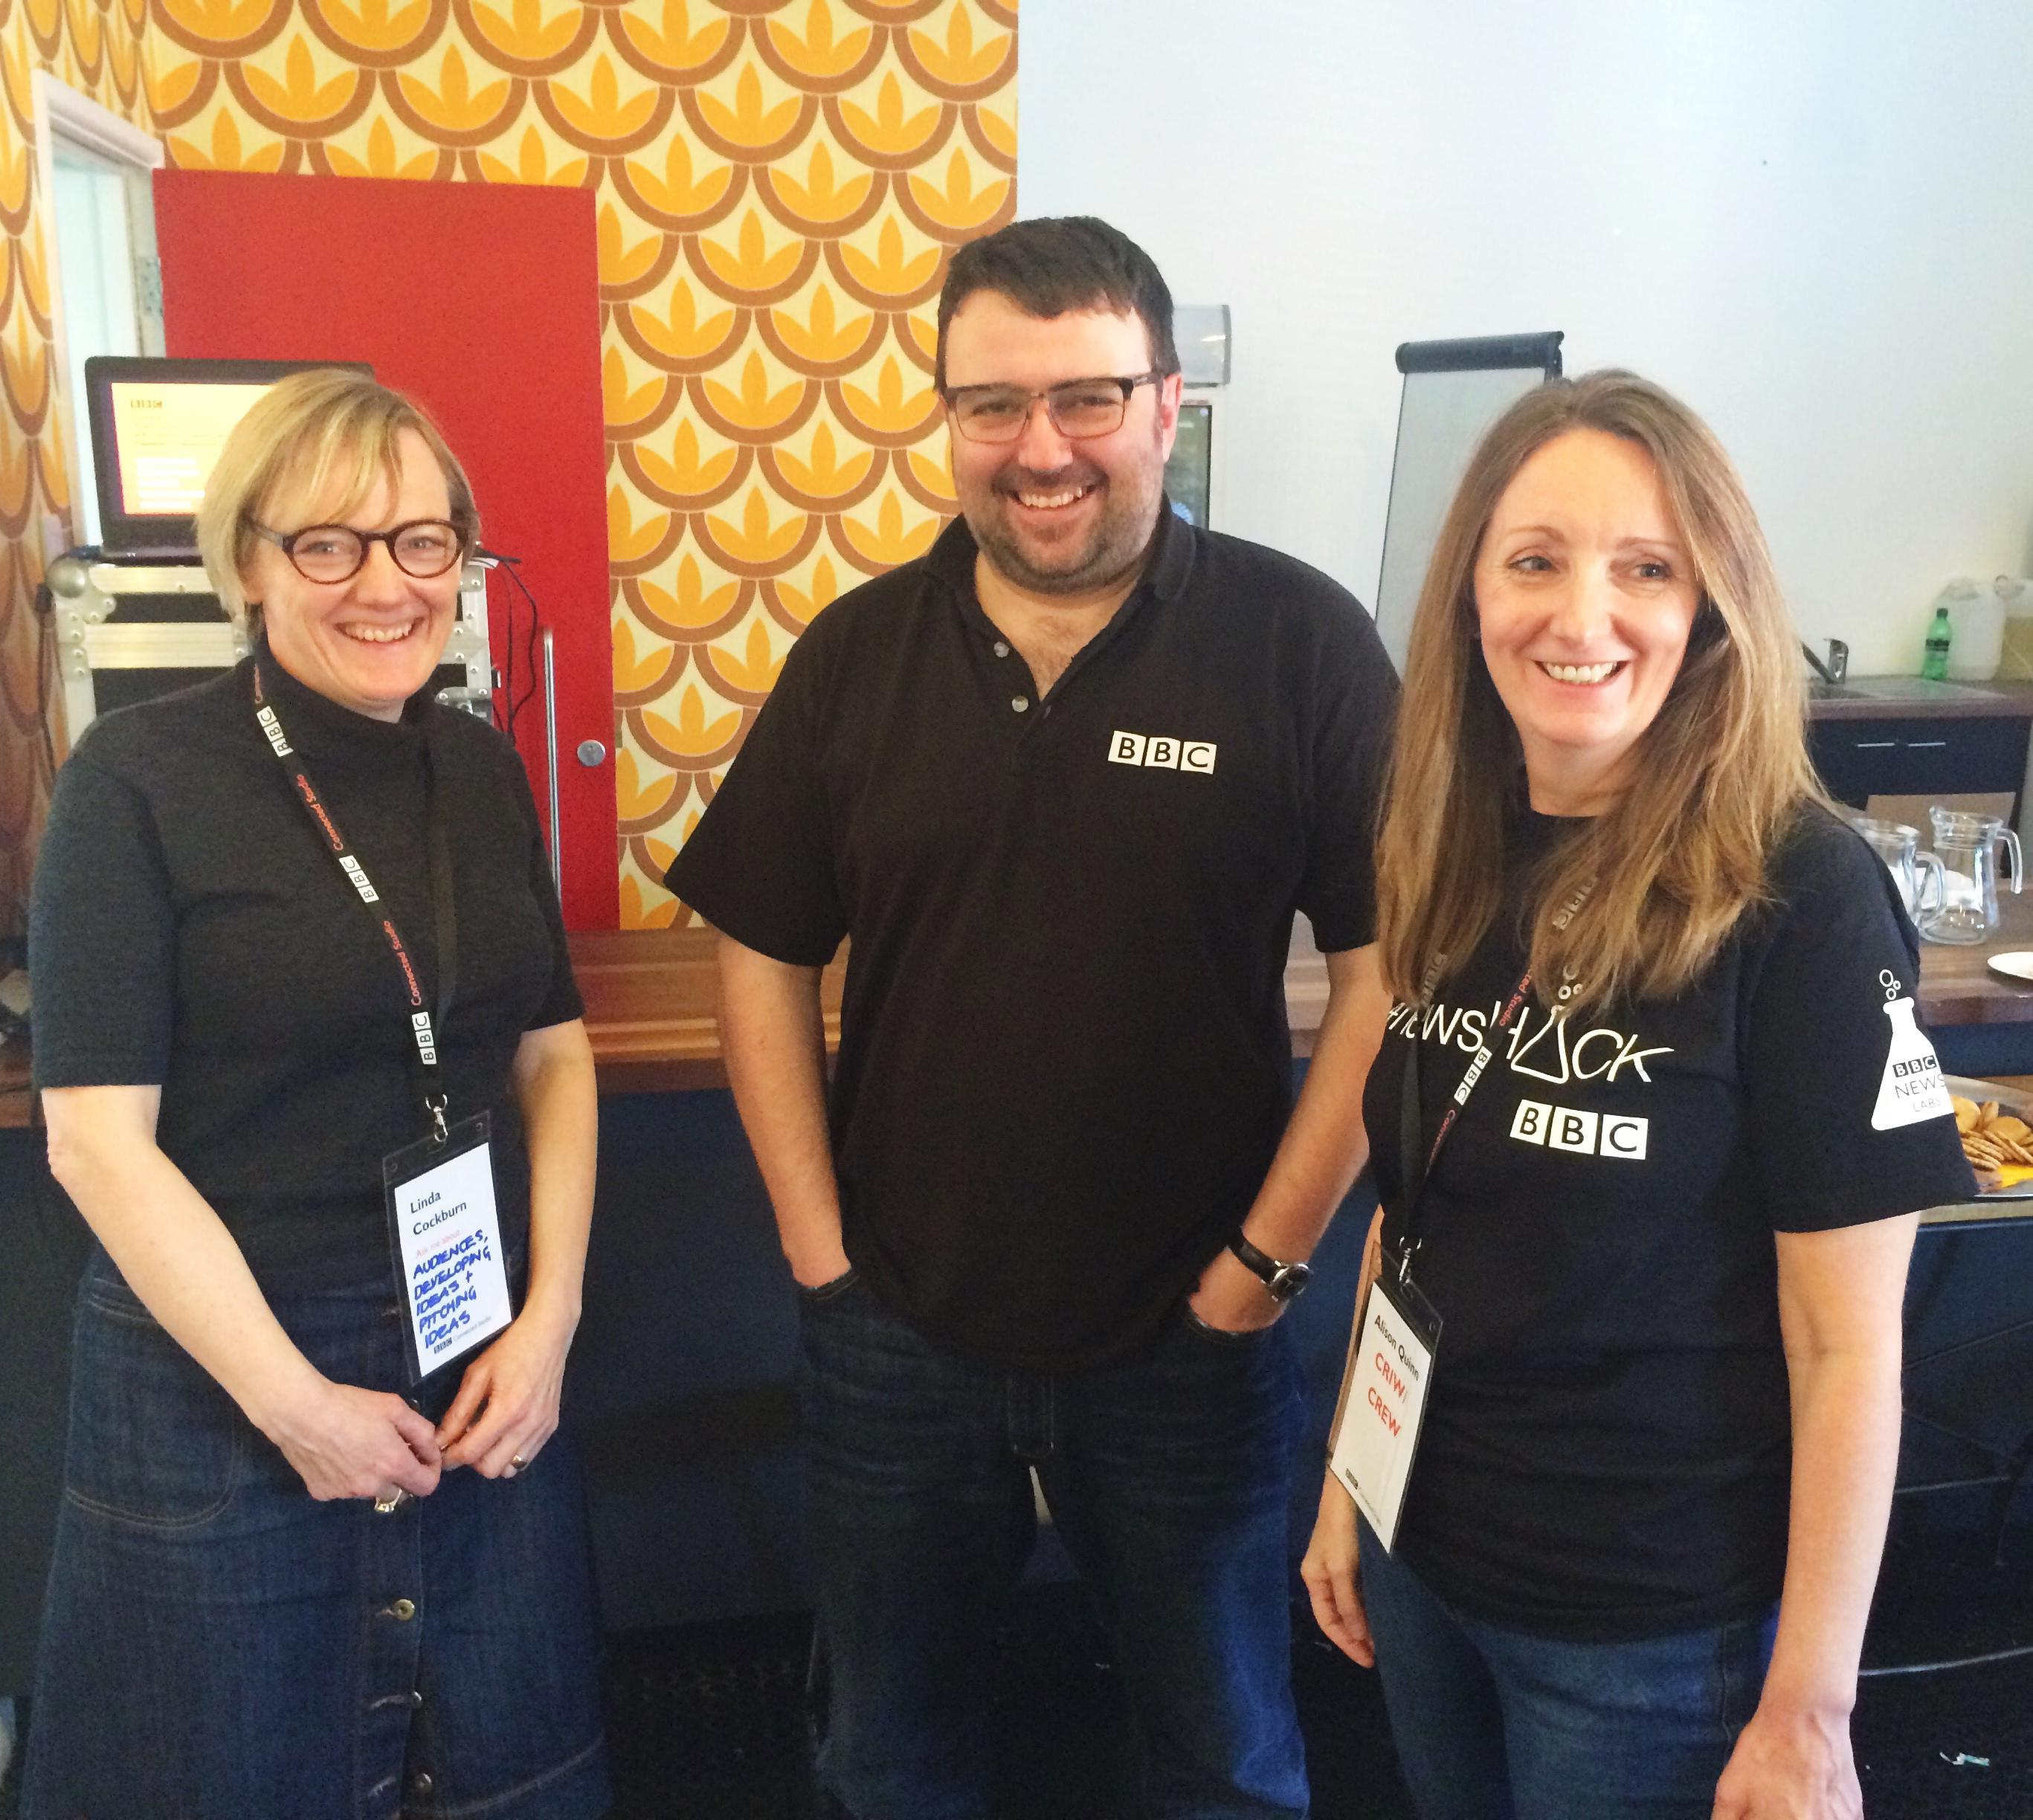 Linda Cockburn, Jeremy Tarling and Alison Quinn in Cardiff at #newsHACK